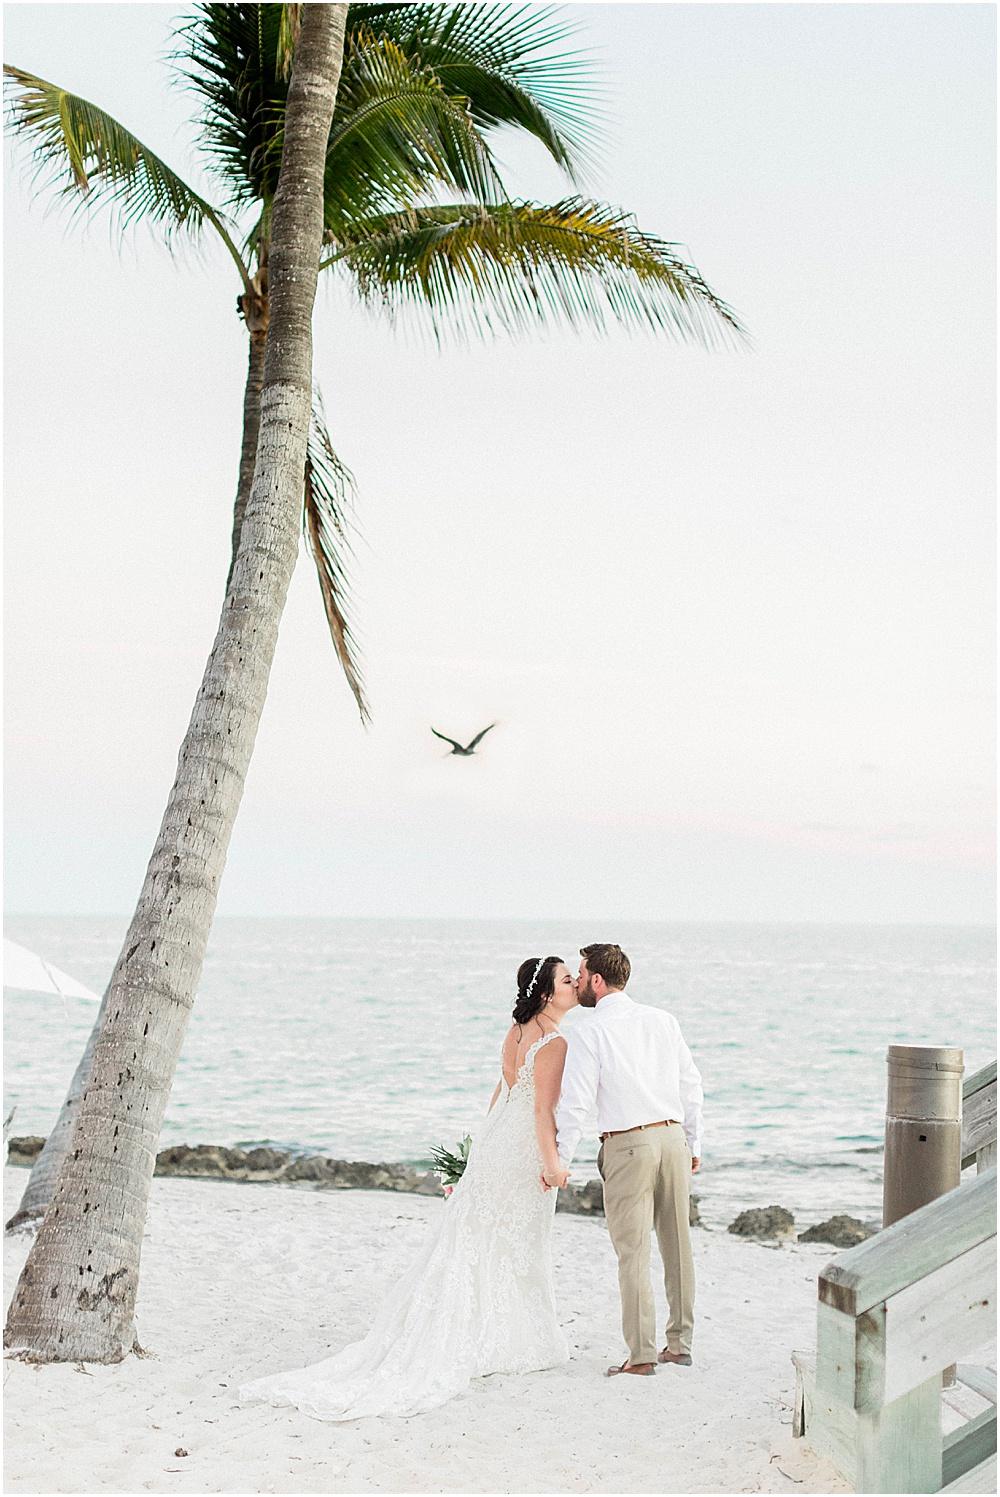 casa_marina_key_west_florida_destination_palm_trees_boston_wedding_photographer_meredith_jane_photography_photo_0122.jpg